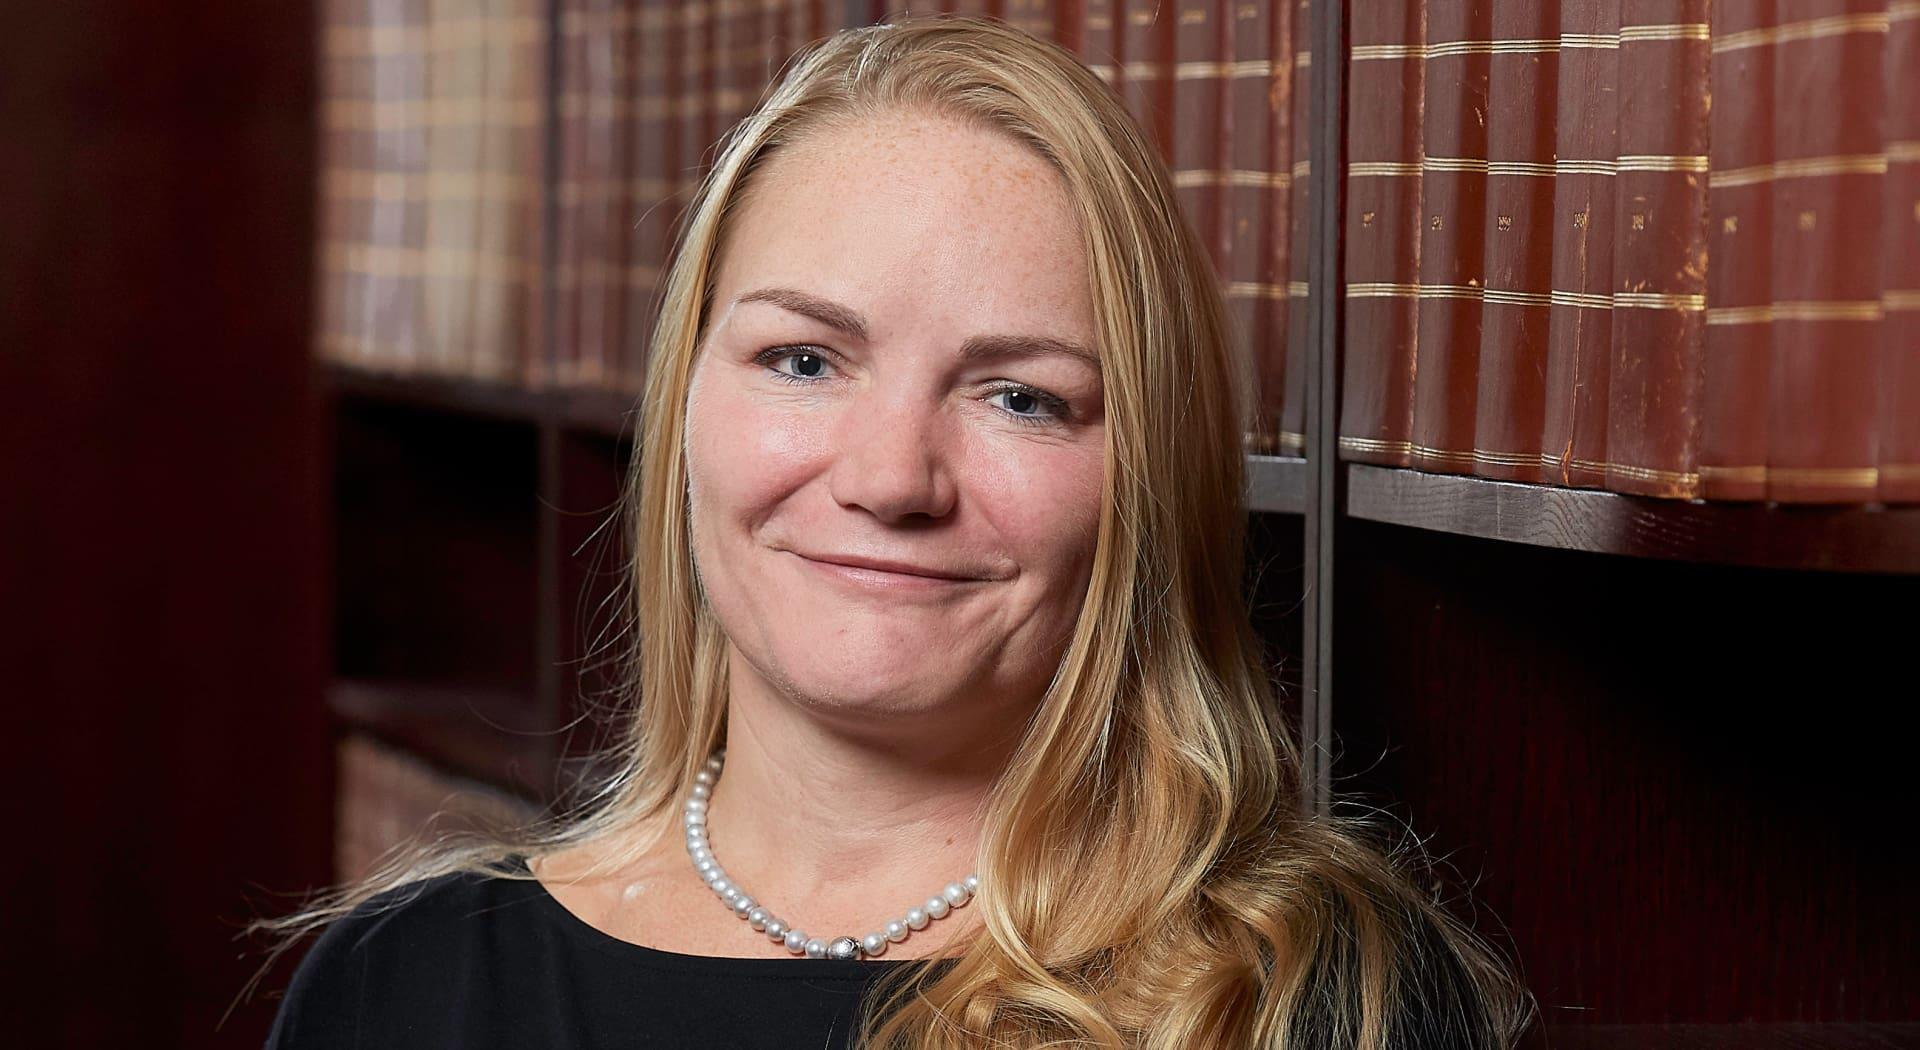 Advokat Kristin Kvanum Hestnes opplever mange henvendelser der hunder, barn eller syklister har påført andre skader.